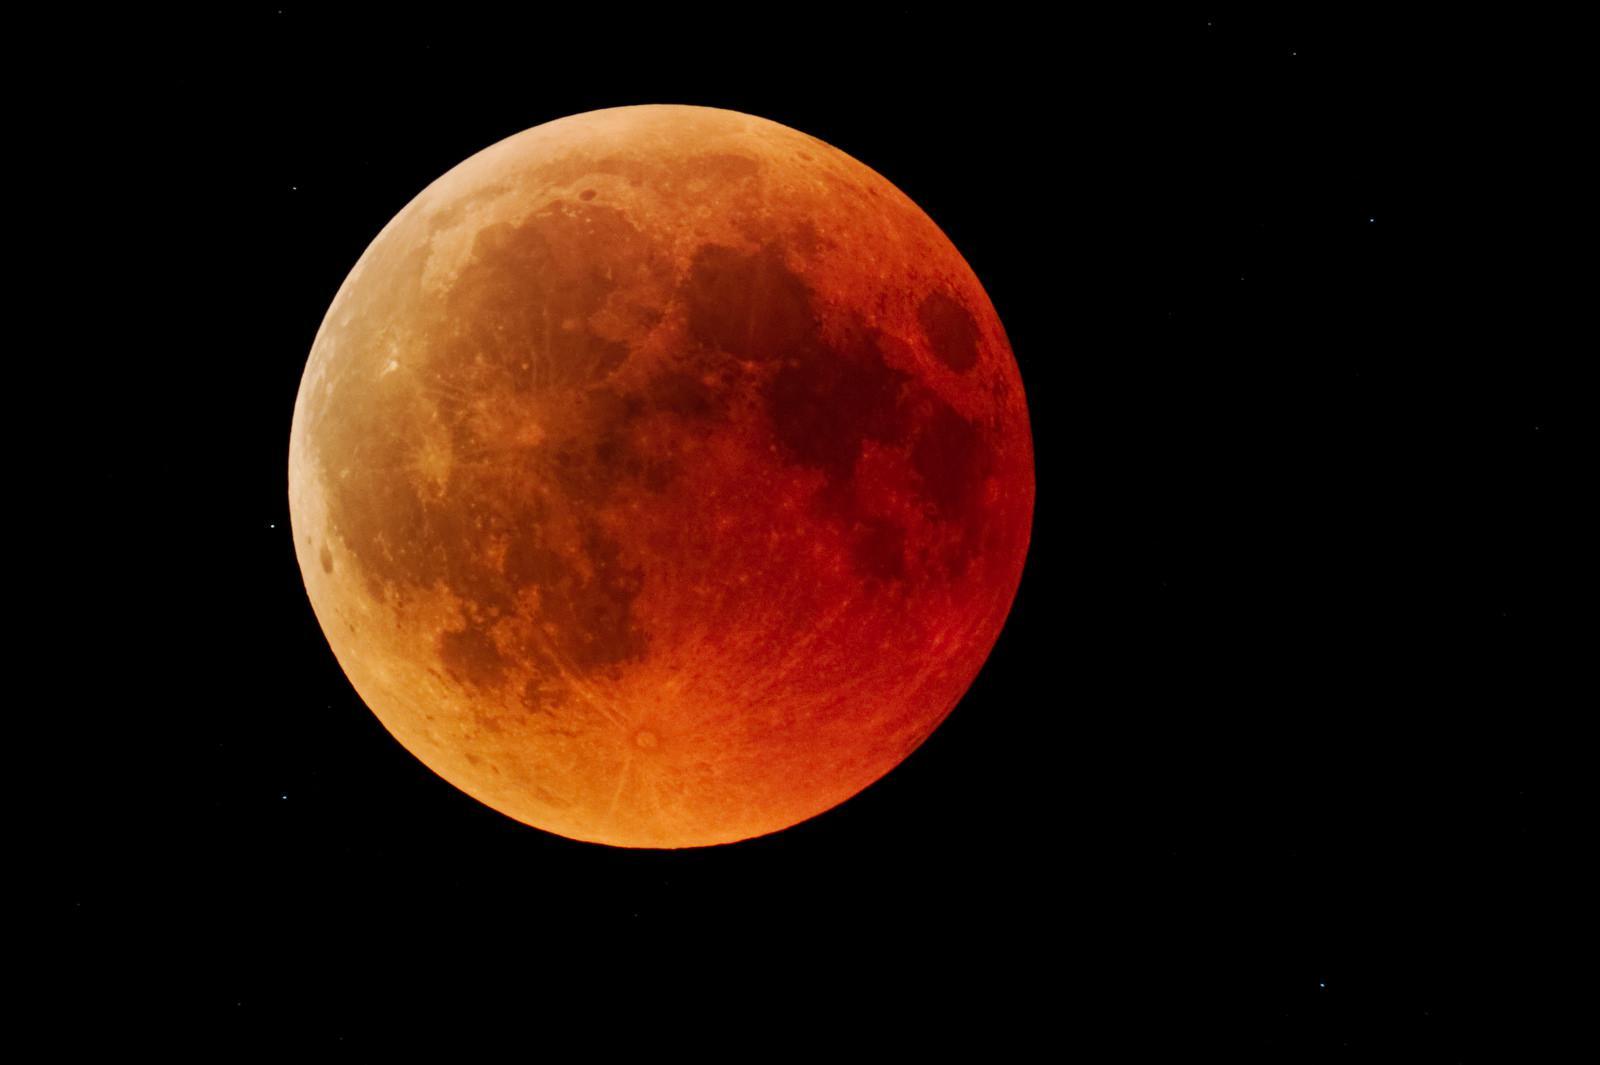 LunarEclipse_Astronomy_Moon_Night.jpg